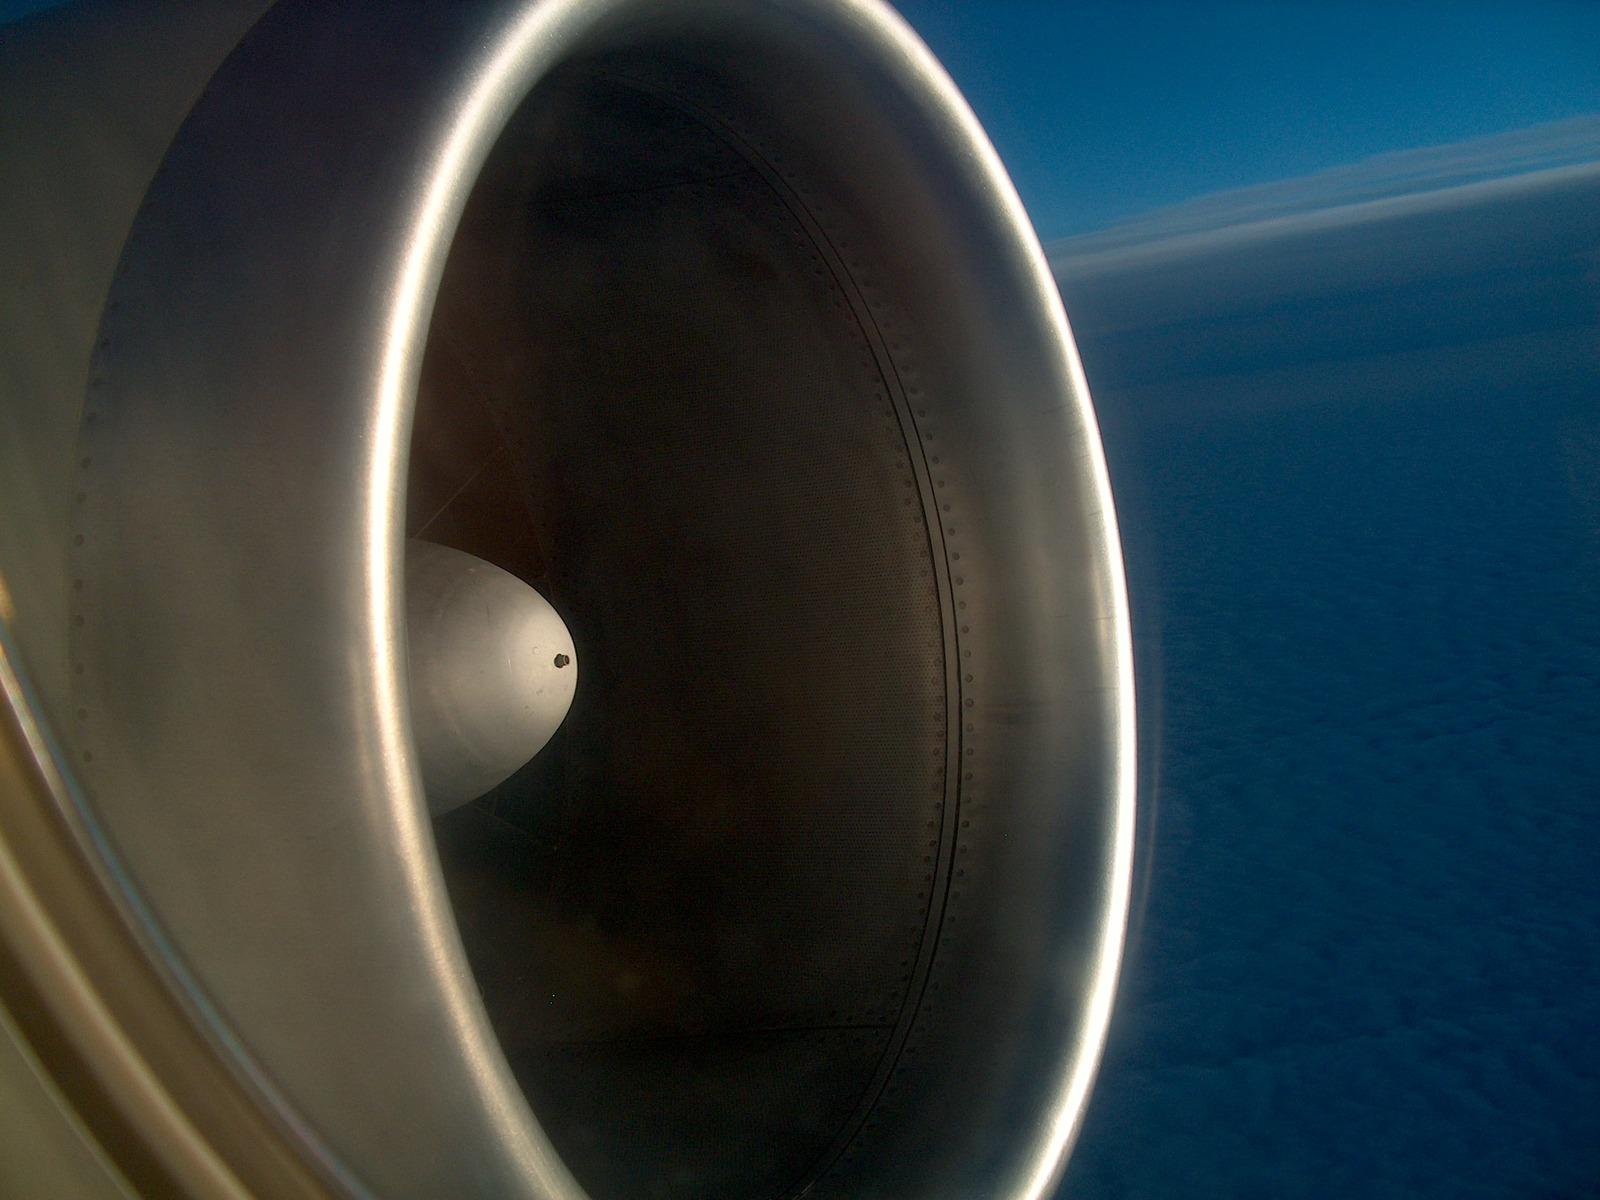 Aircraft Engine Wallpaper Jet Engine Wallpaper The